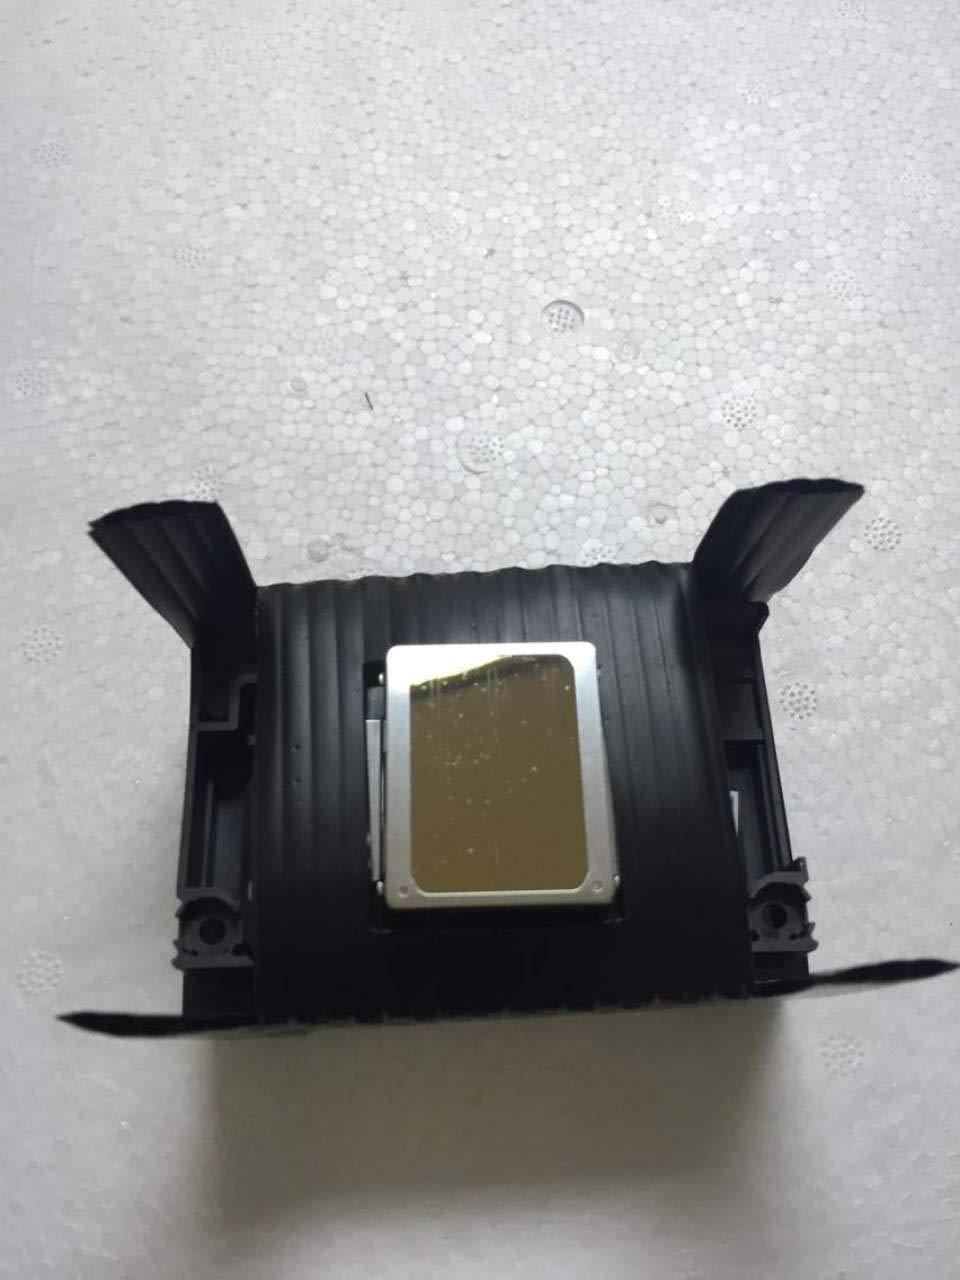 Printer Parts Brand F180000 Print Head for Eps0n R280 R285 R690 T50 T59 T60 P50 P60 A50 A60 A840 A960 A940 T960 PX610 PX650 L800